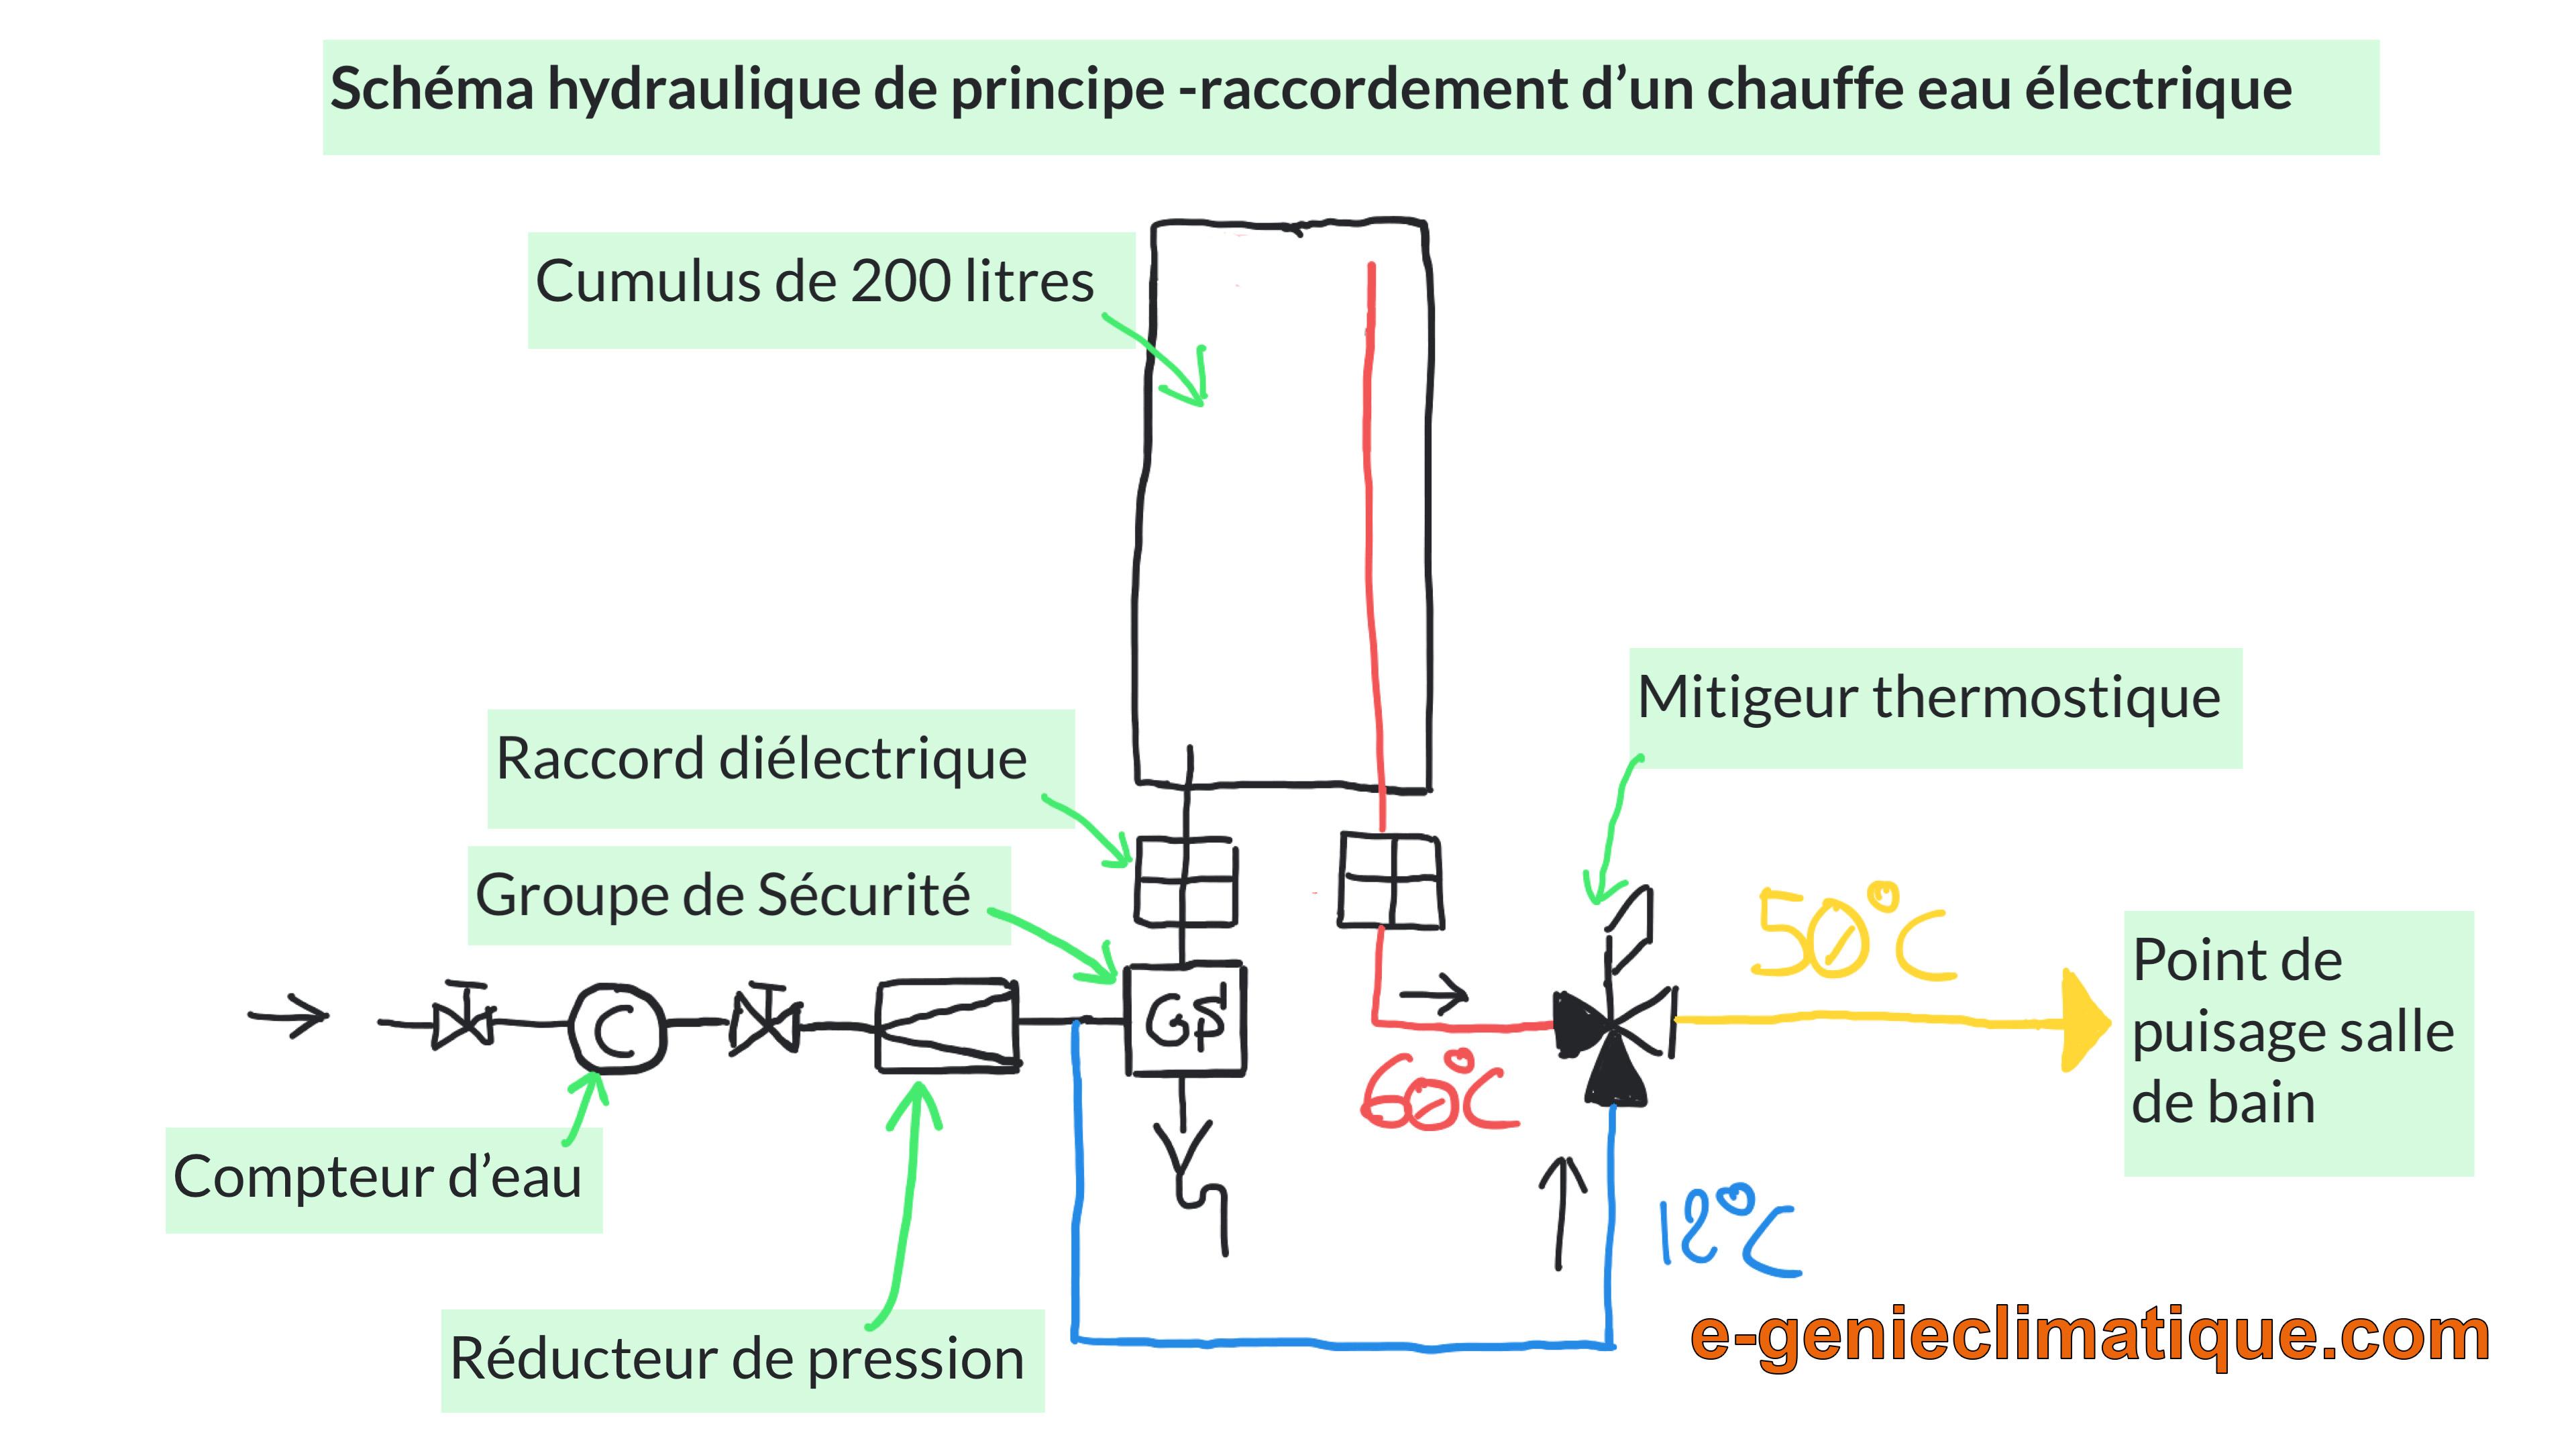 chaufferie04 diff rents sch mas hydraulique de principe de chaufferie de chauffage et du. Black Bedroom Furniture Sets. Home Design Ideas